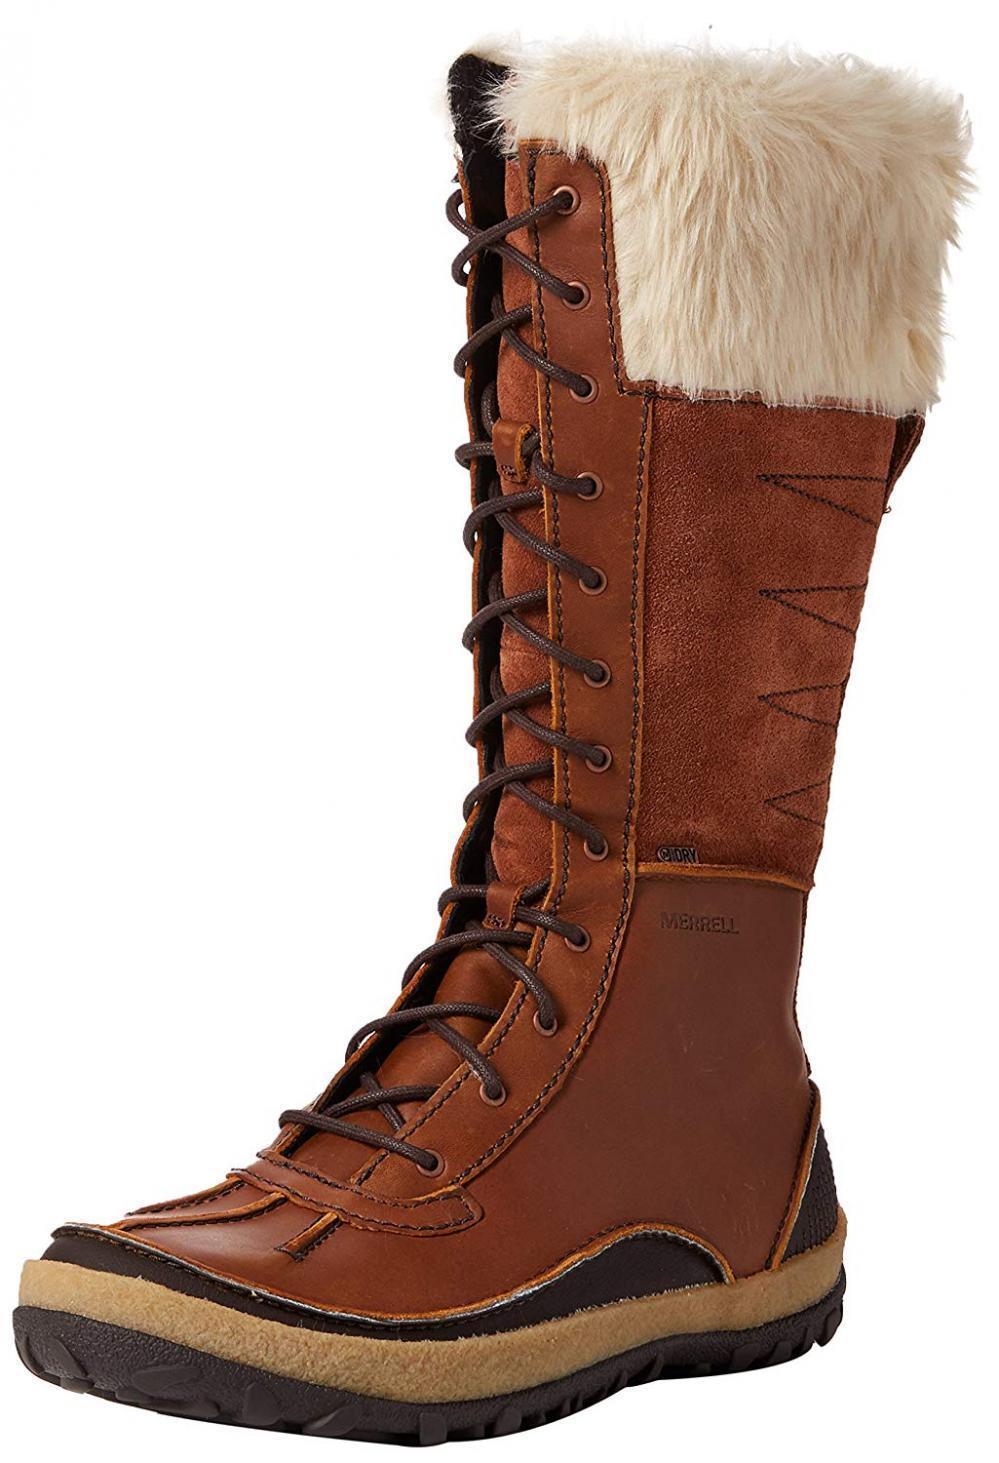 Merrell Women's Tremblant Tall Polar Waterproof Snow Snow Snow Boot 2c0fe6